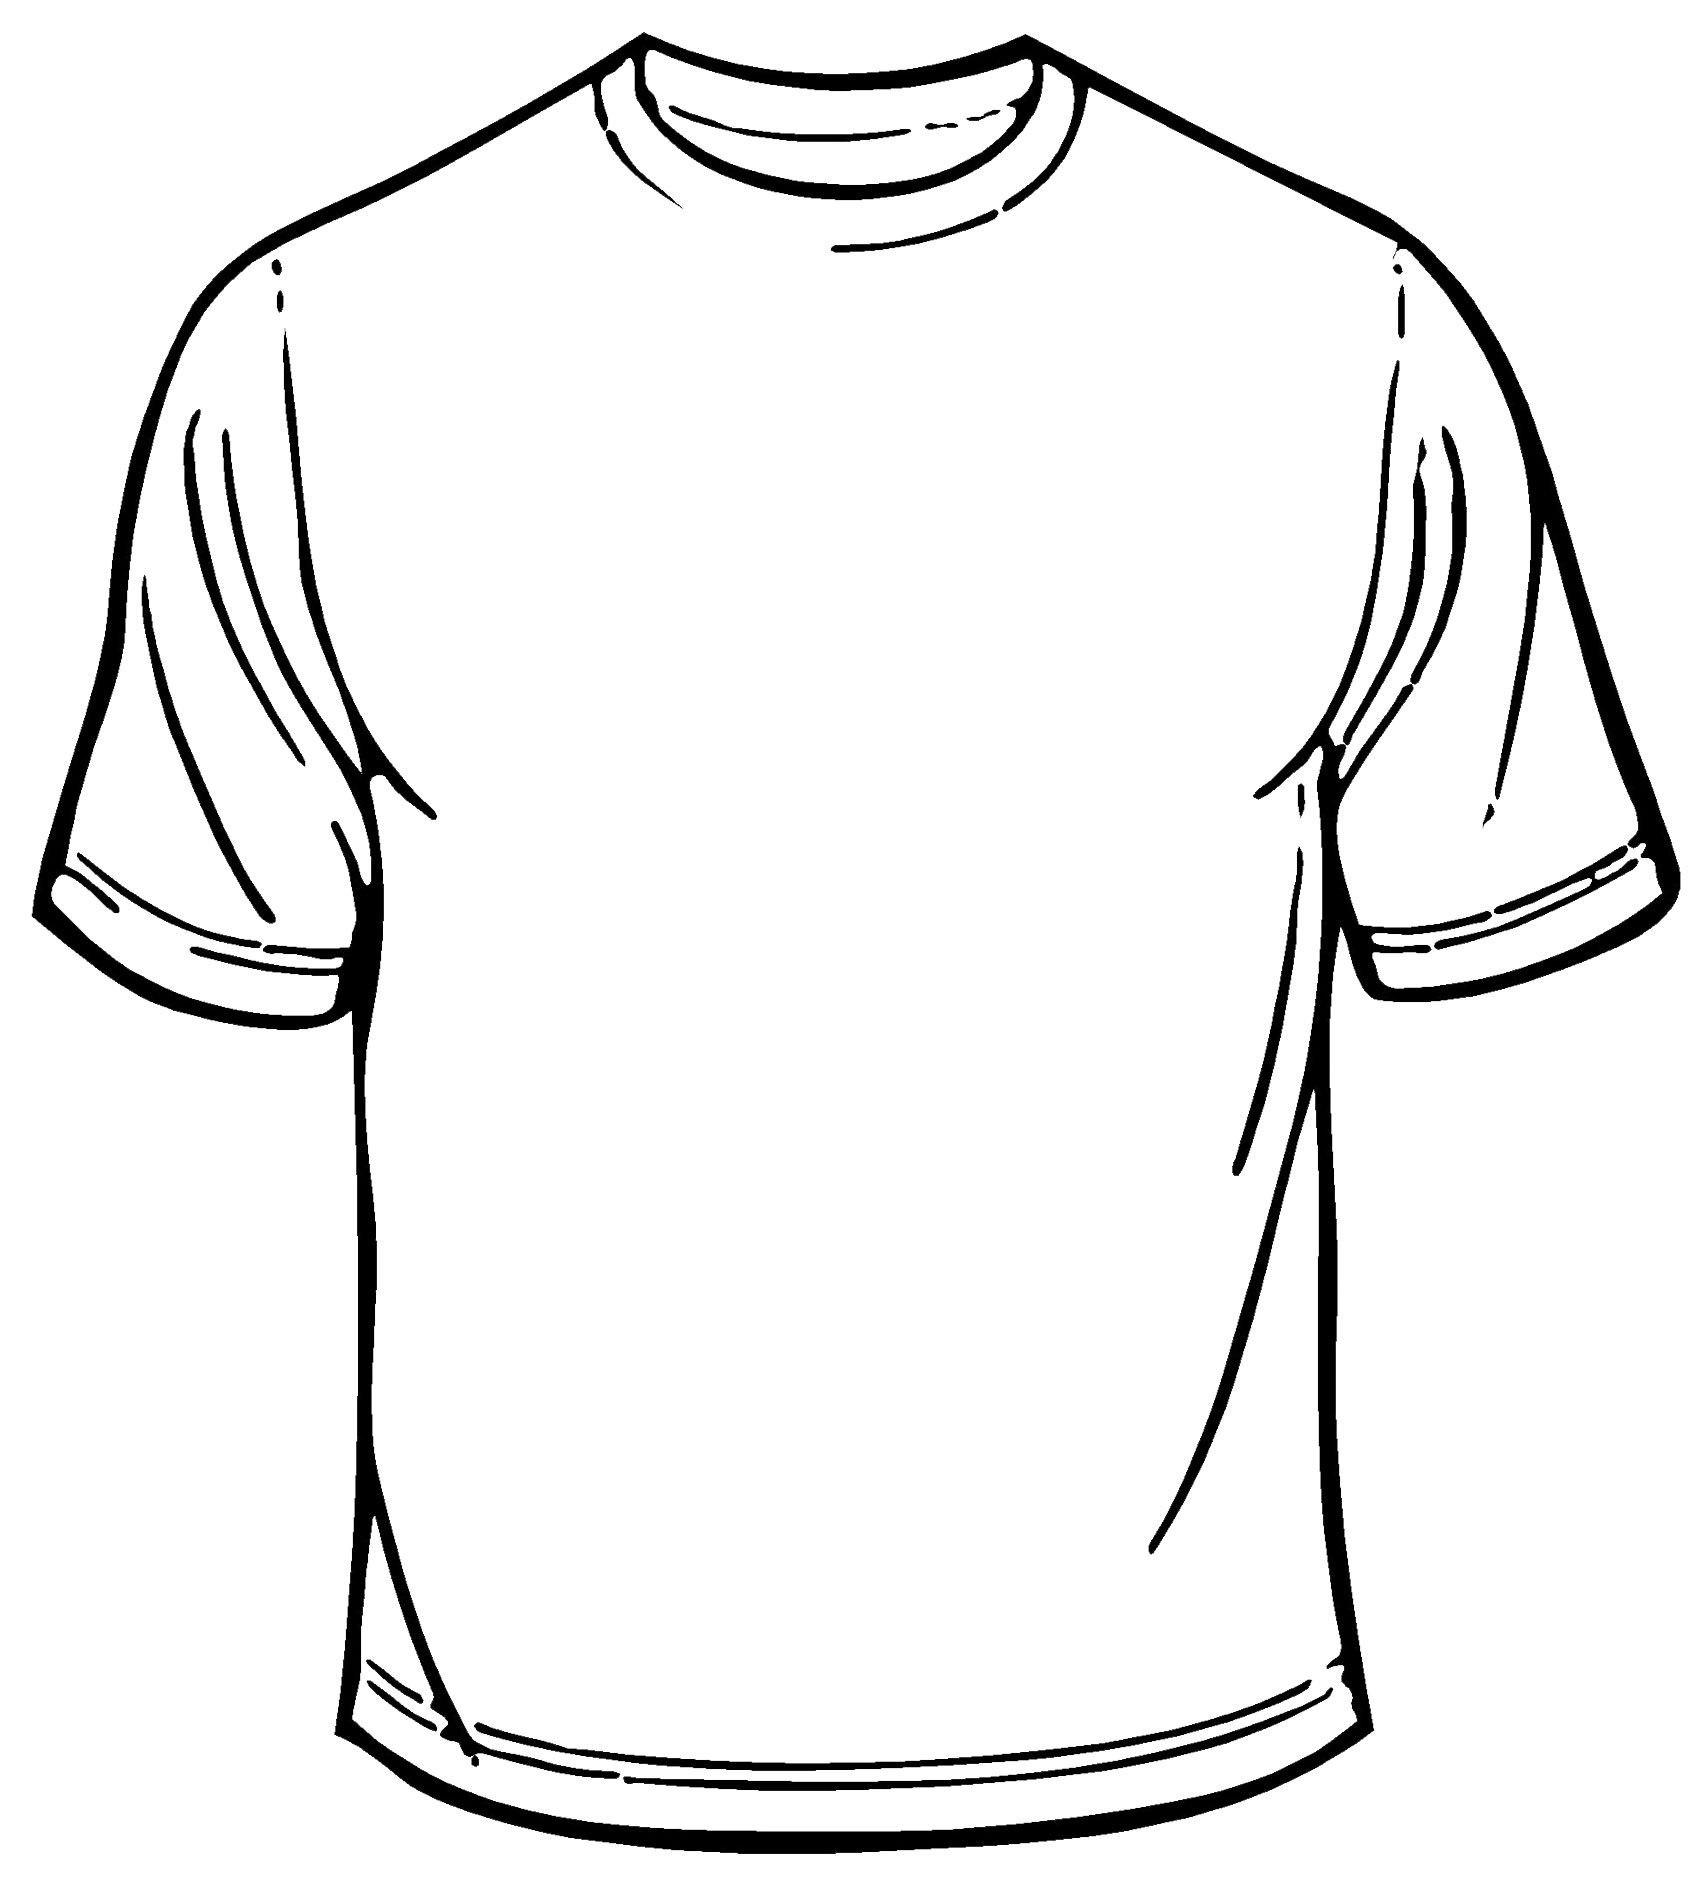 Pinbest Shirts Shirt For Men  Women On Shirts  Shirt Regarding Printable Blank Tshirt Template